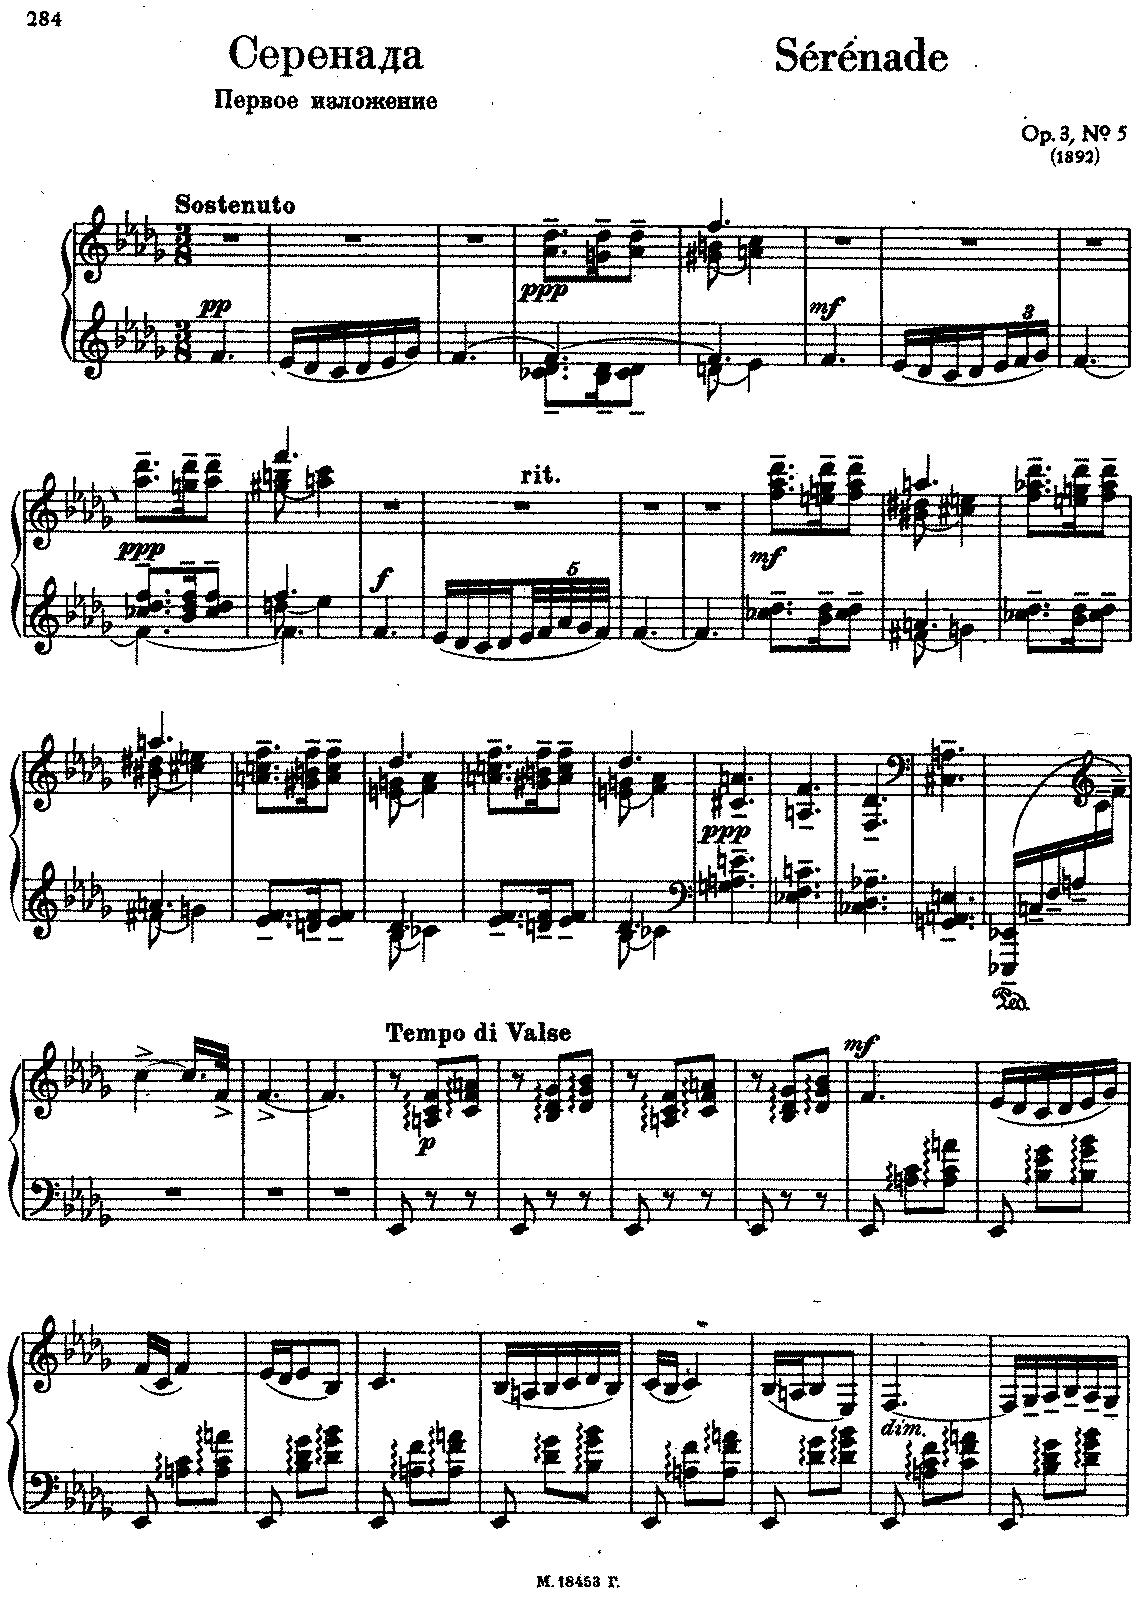 Exceptionnel Morceaux de fantaisie, Op.3 (Rachmaninoff, Sergei) - IMSLP  ZD73